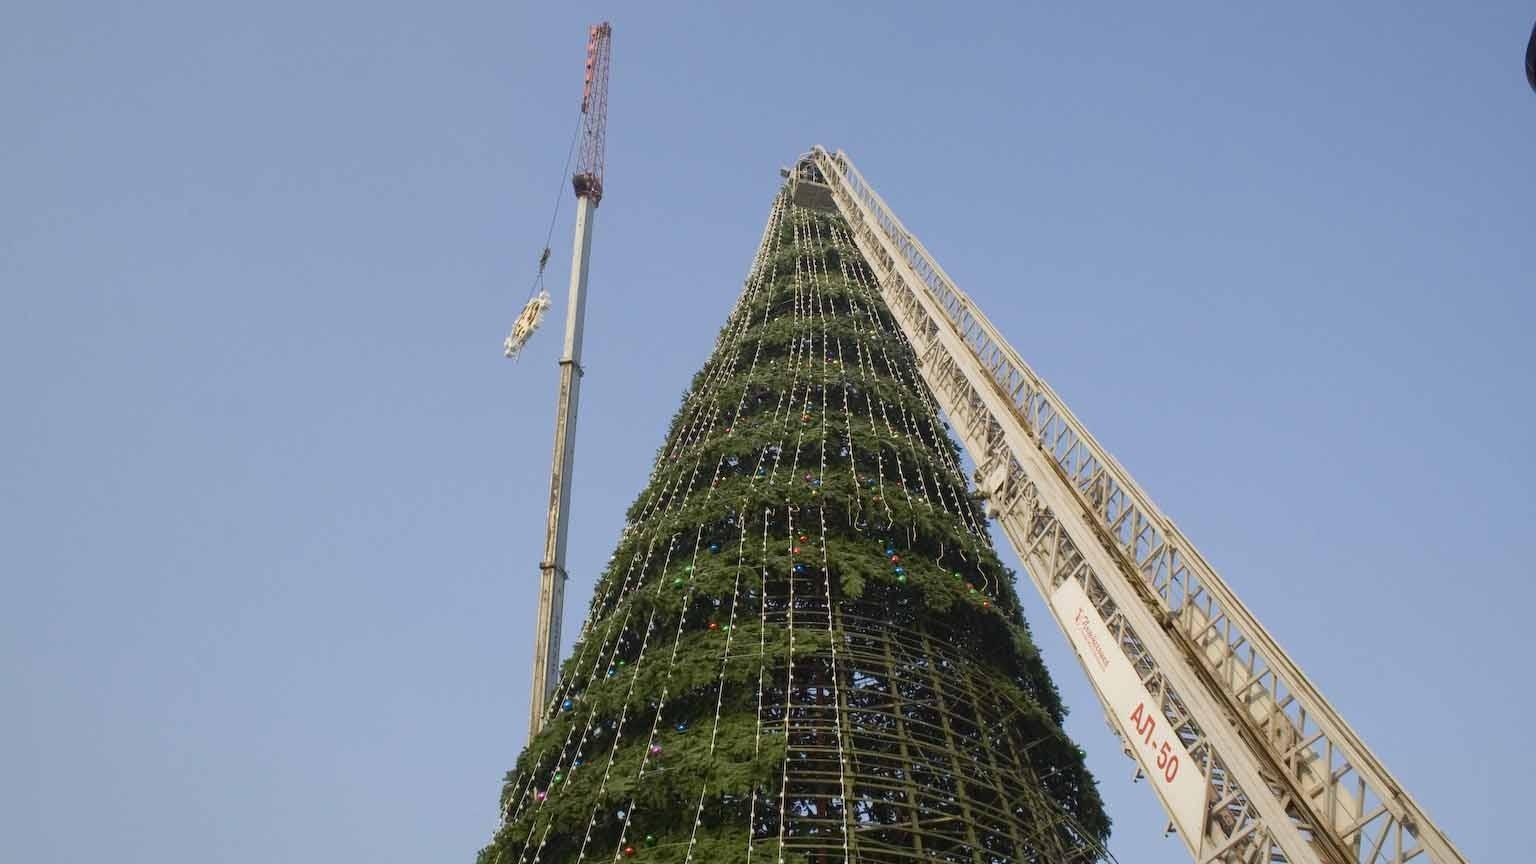 ВБурятии новогодняя елка повредила три автомобиля